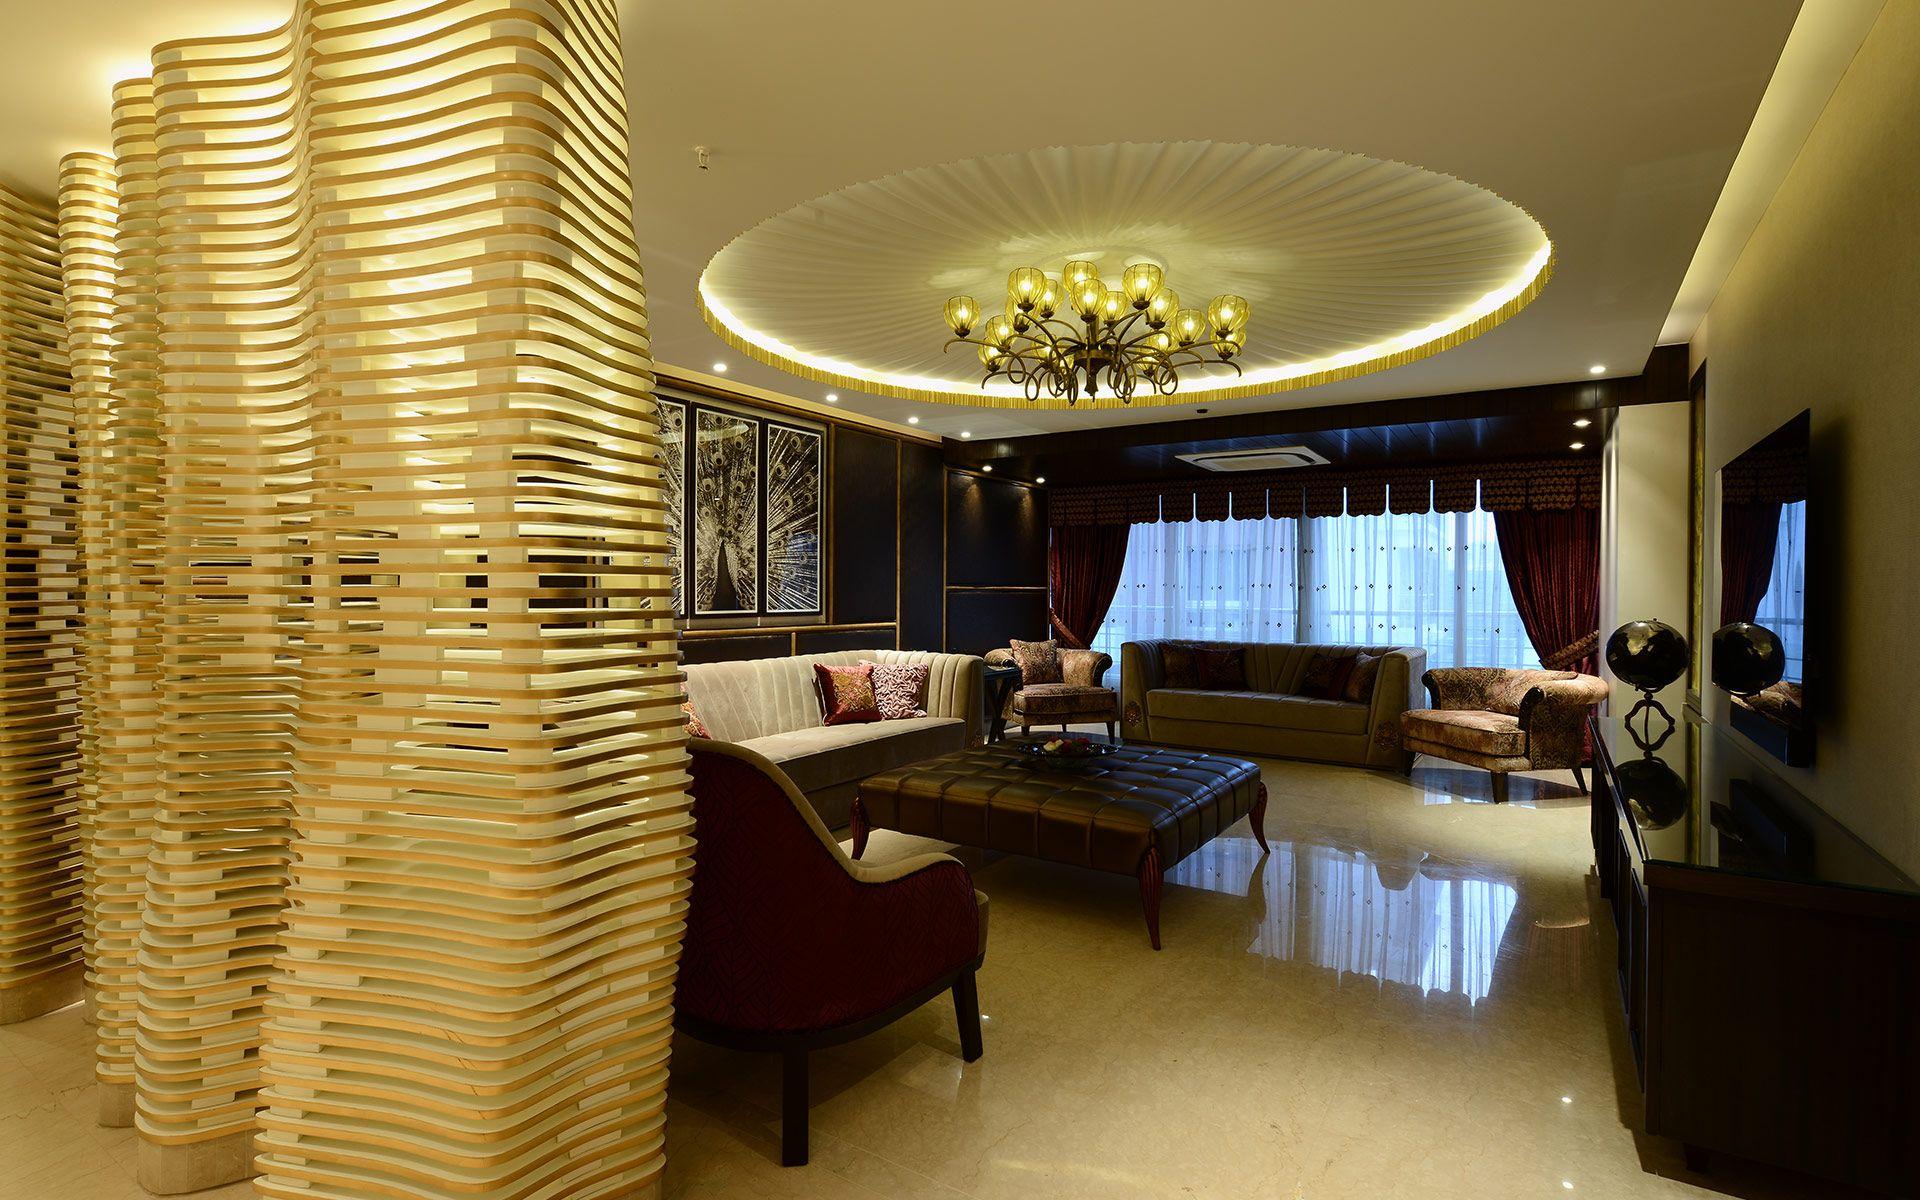 Best Architecture And Top Interior Design In India Bangalore In